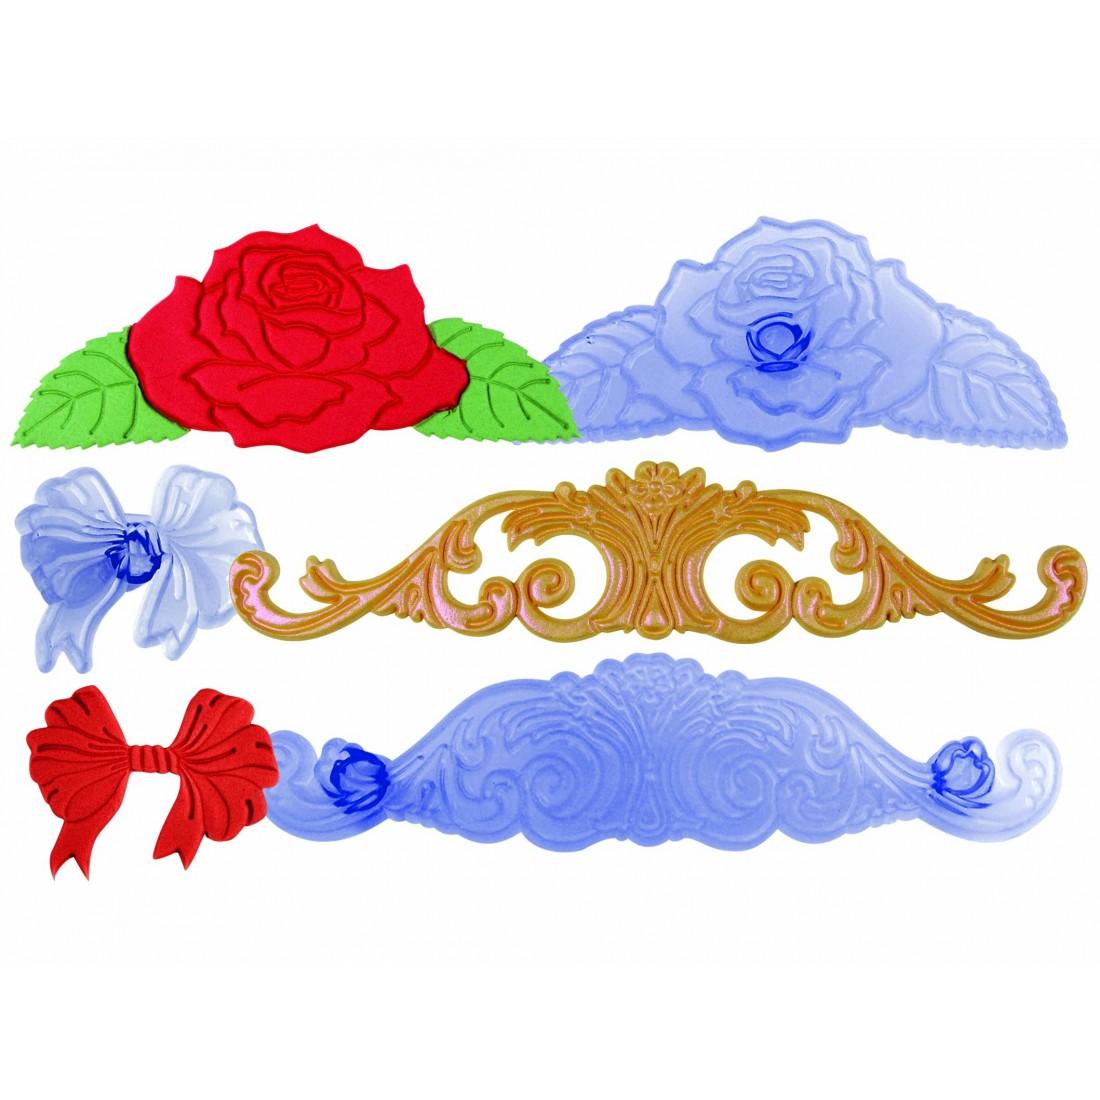 Elegant Range bow, rose & scrolls icing cutter set